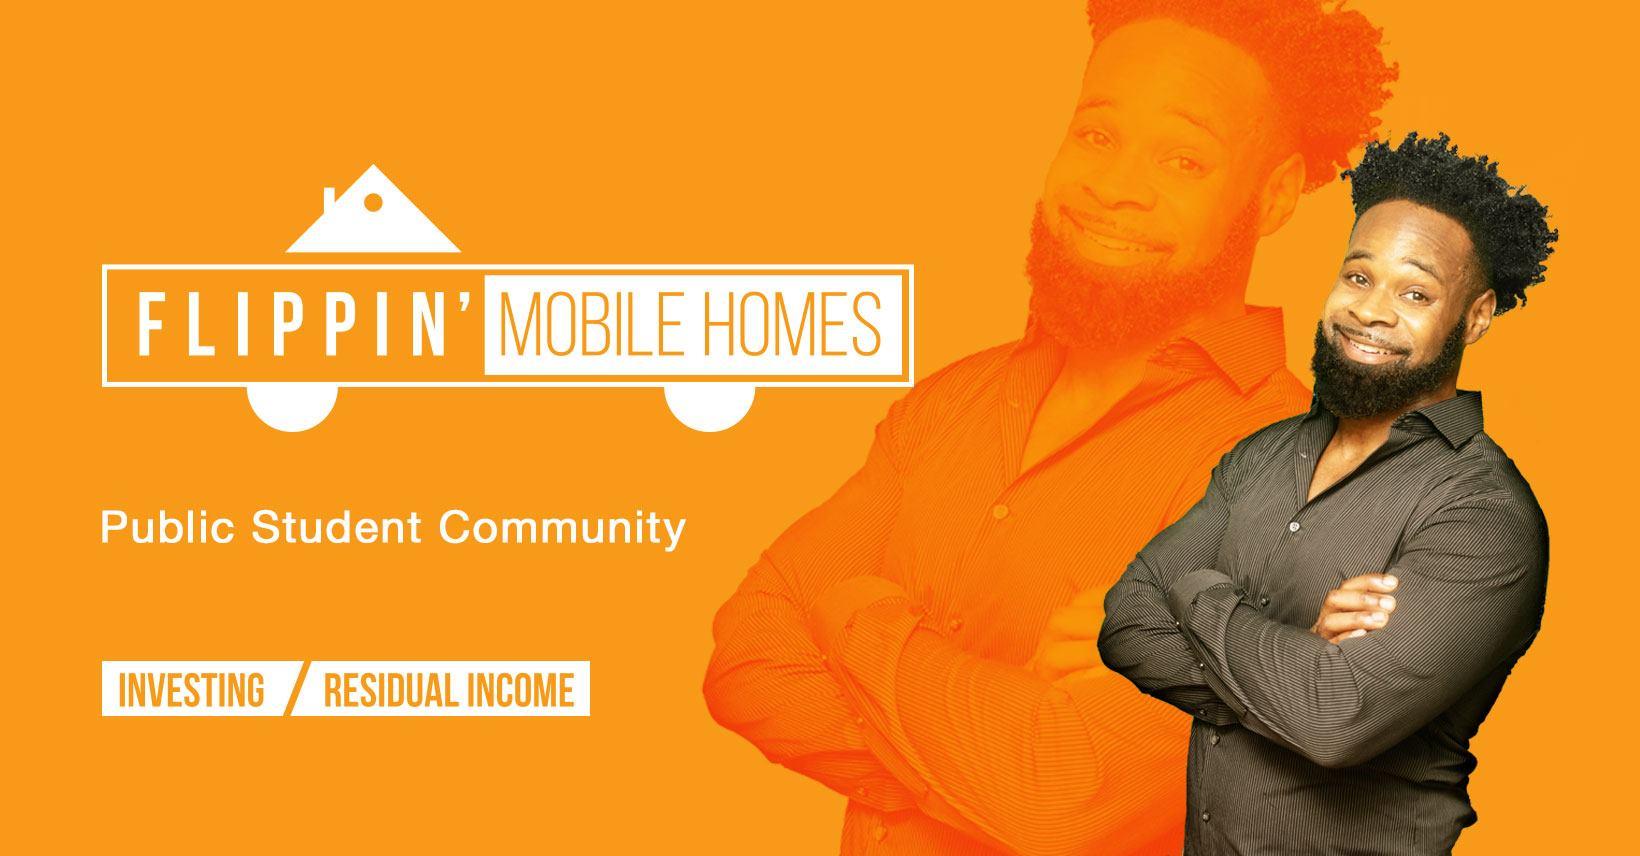 Flippin Mobile Homes Facebook